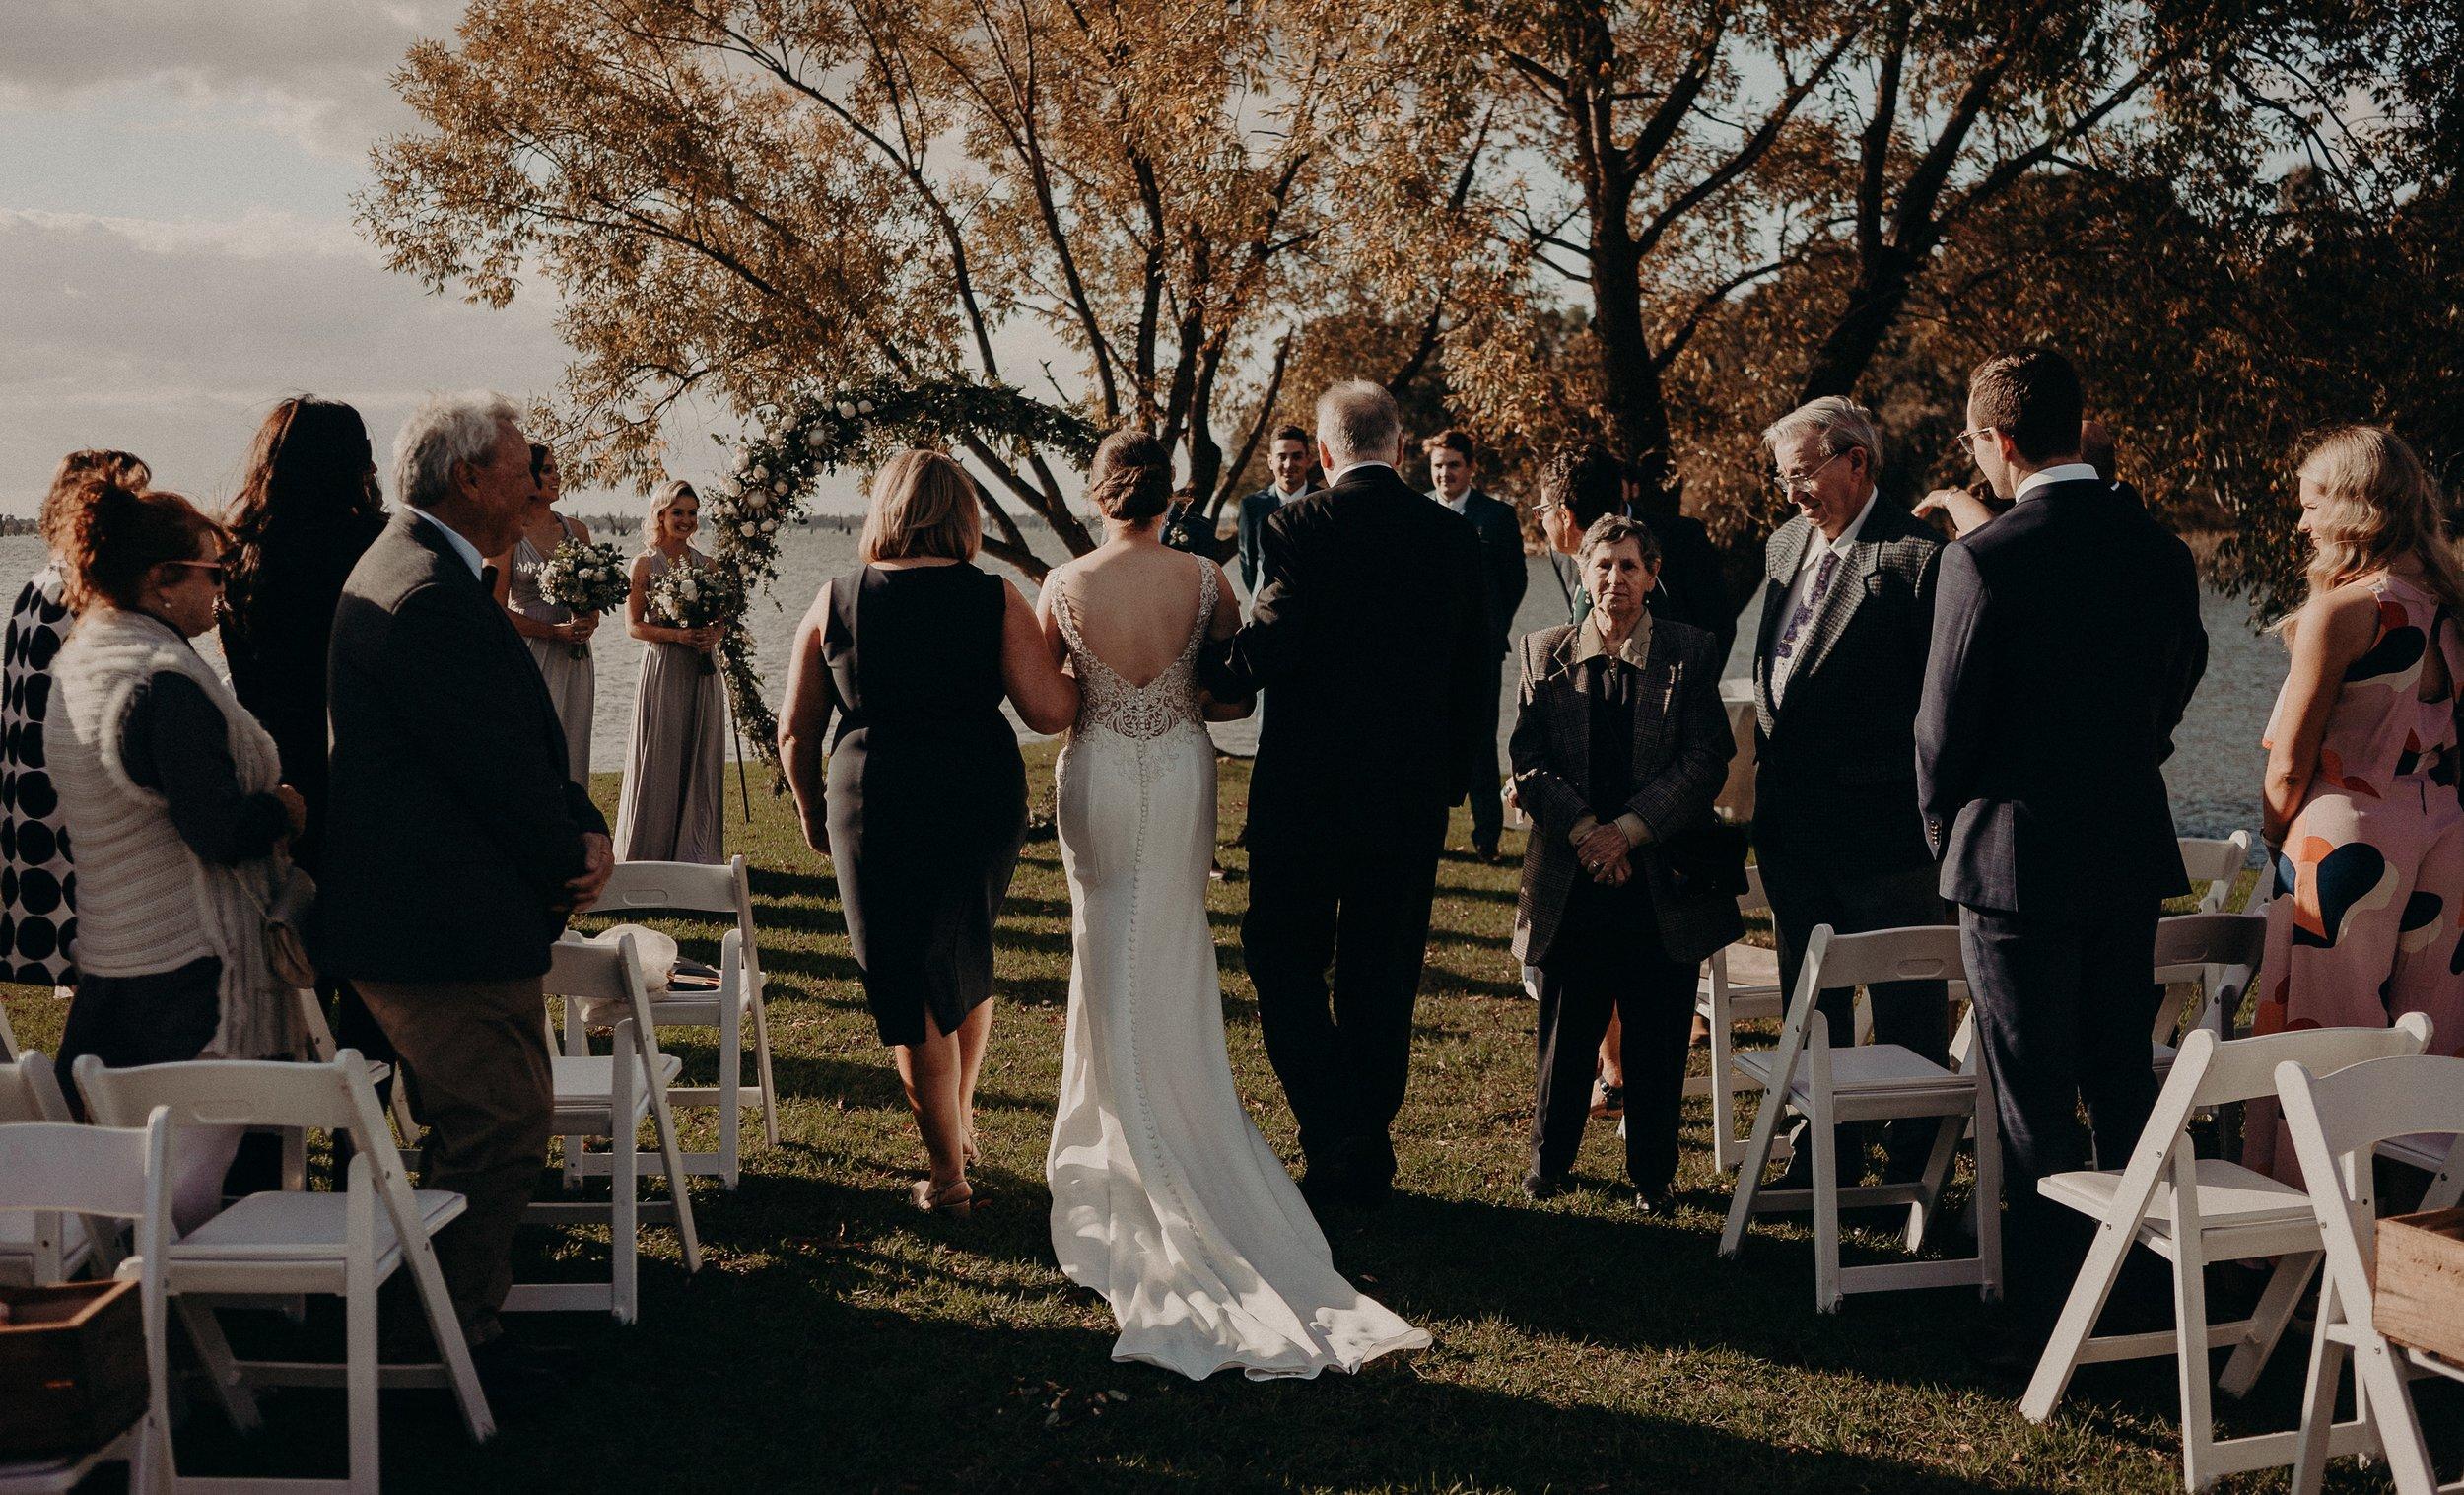 mickalathomas_puremacphotography_weddingphotographer_couplephotographer_Sheppartonphotographer_2533.jpg